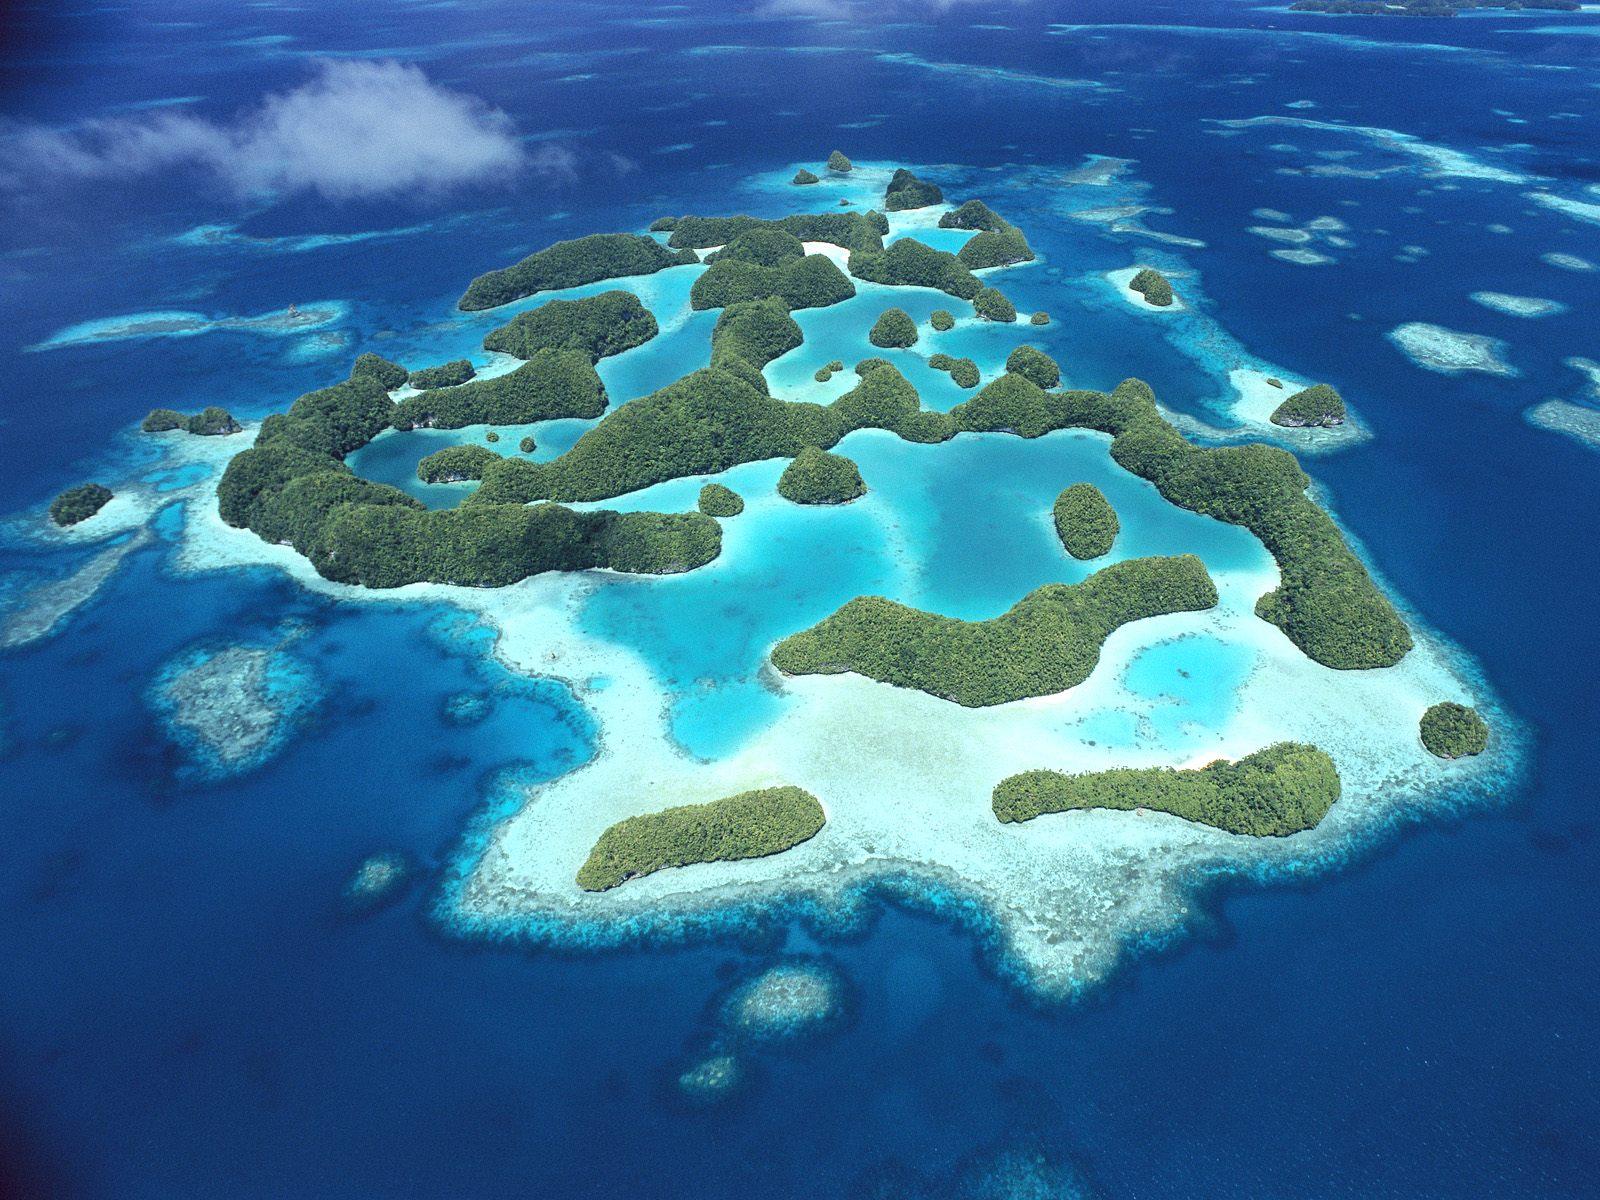 15 Uninhabited Islands That Will Capture Your Imagination